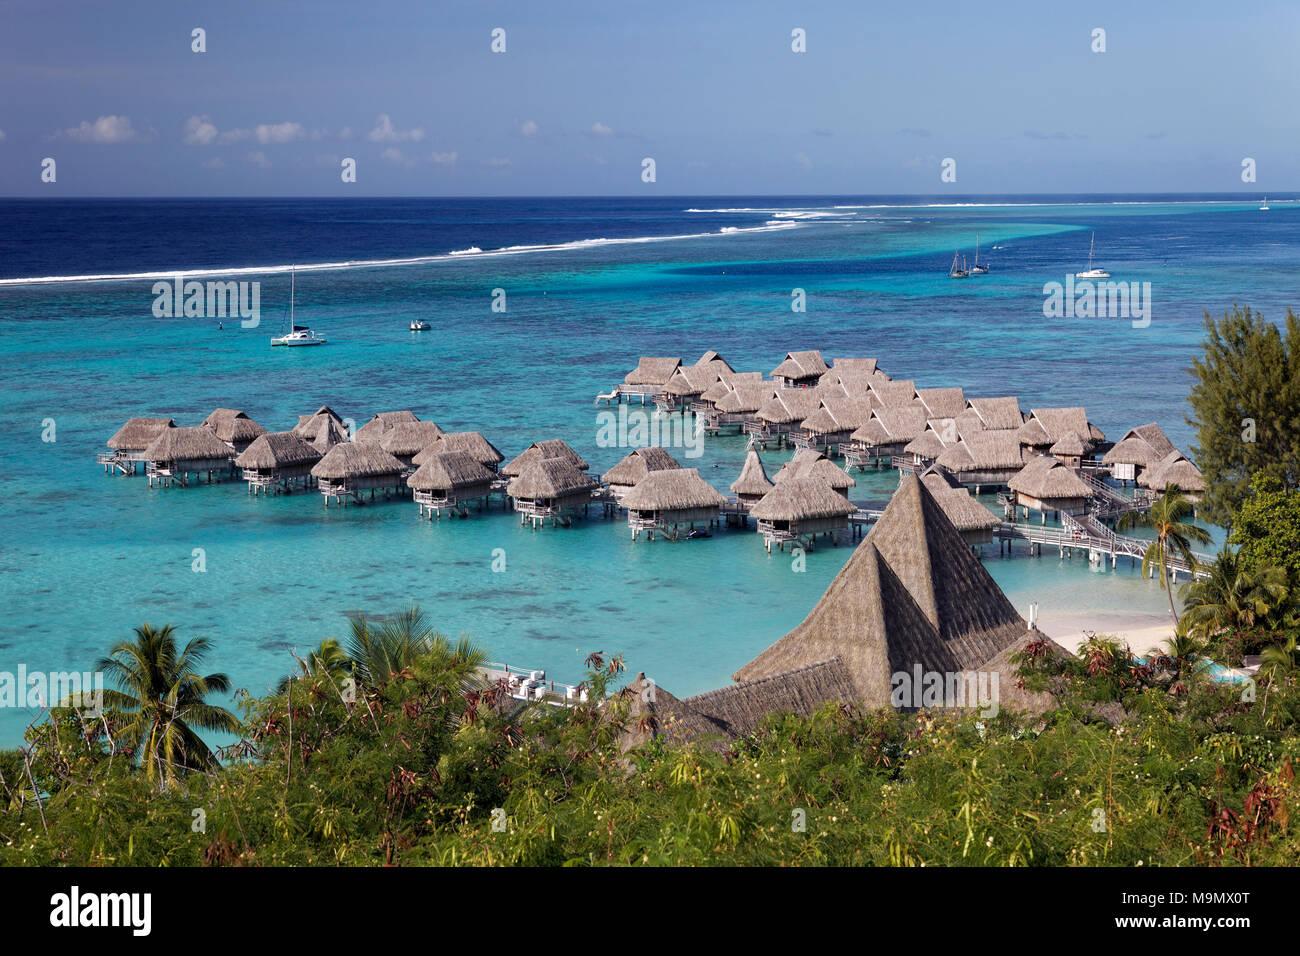 Water Bungalows In Lagoon Sofitel Moorea Hotel Ia Ora Beach